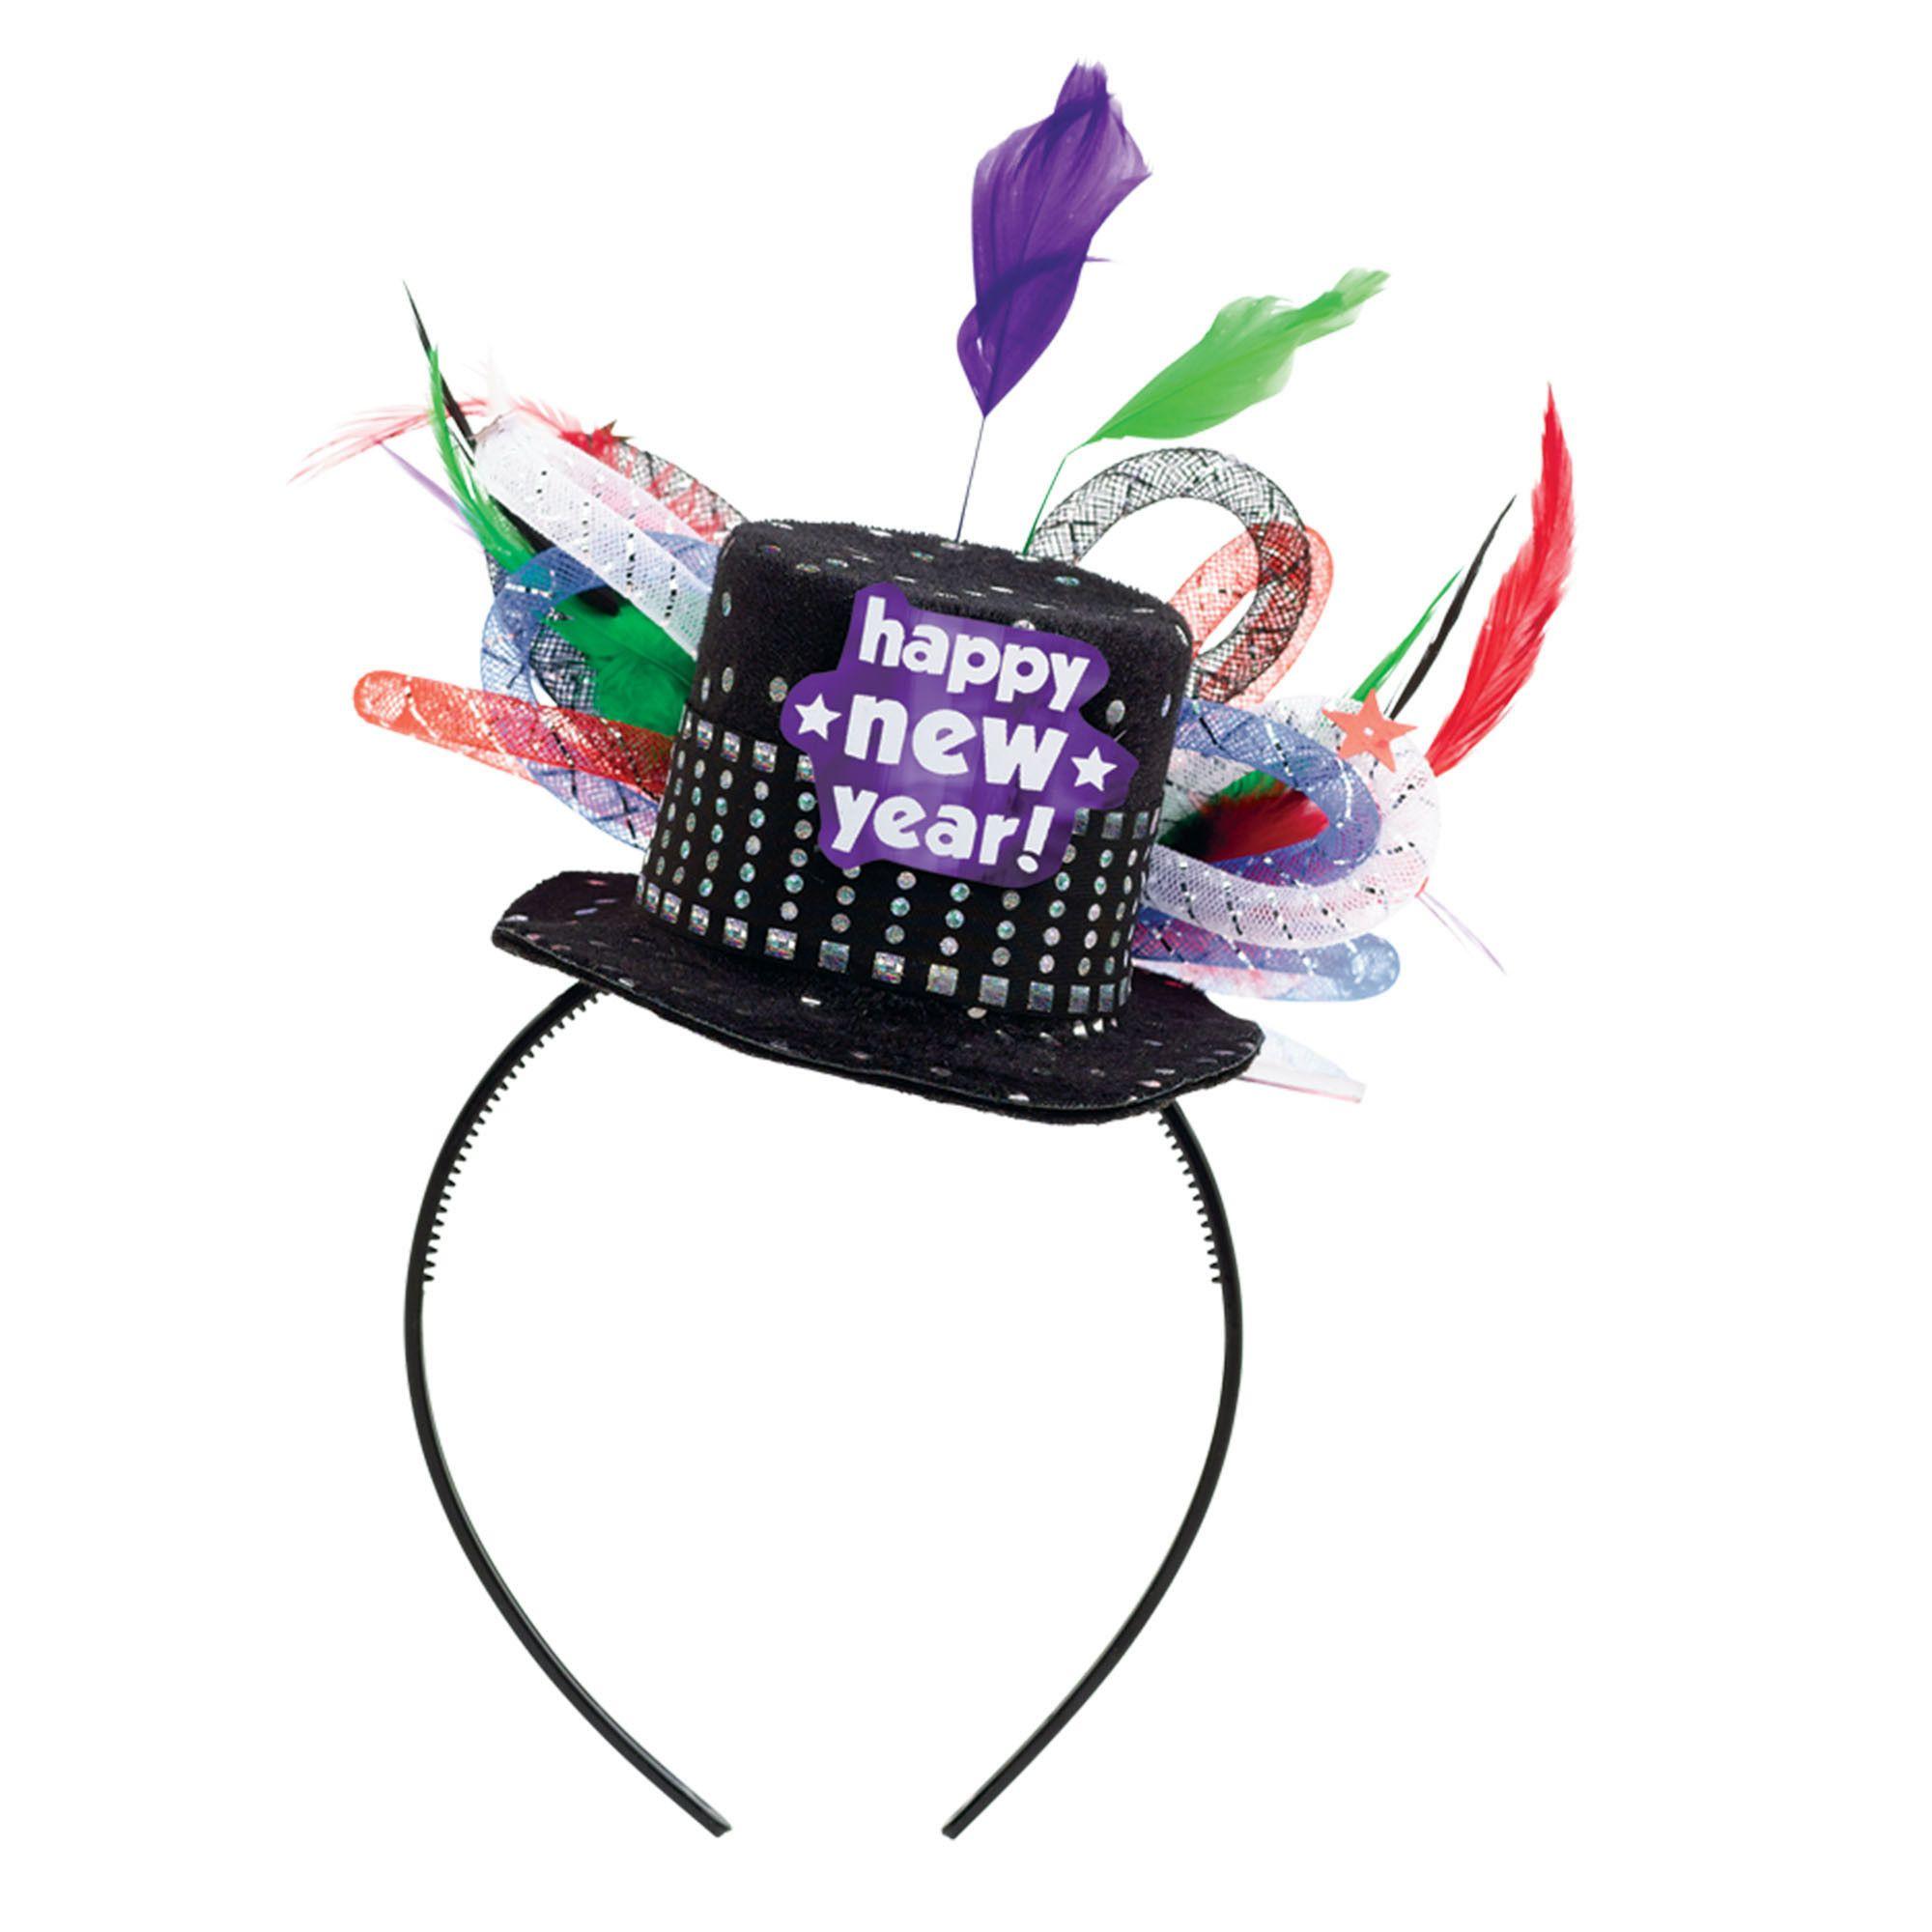 Jewel Dlx. Feathered Headband